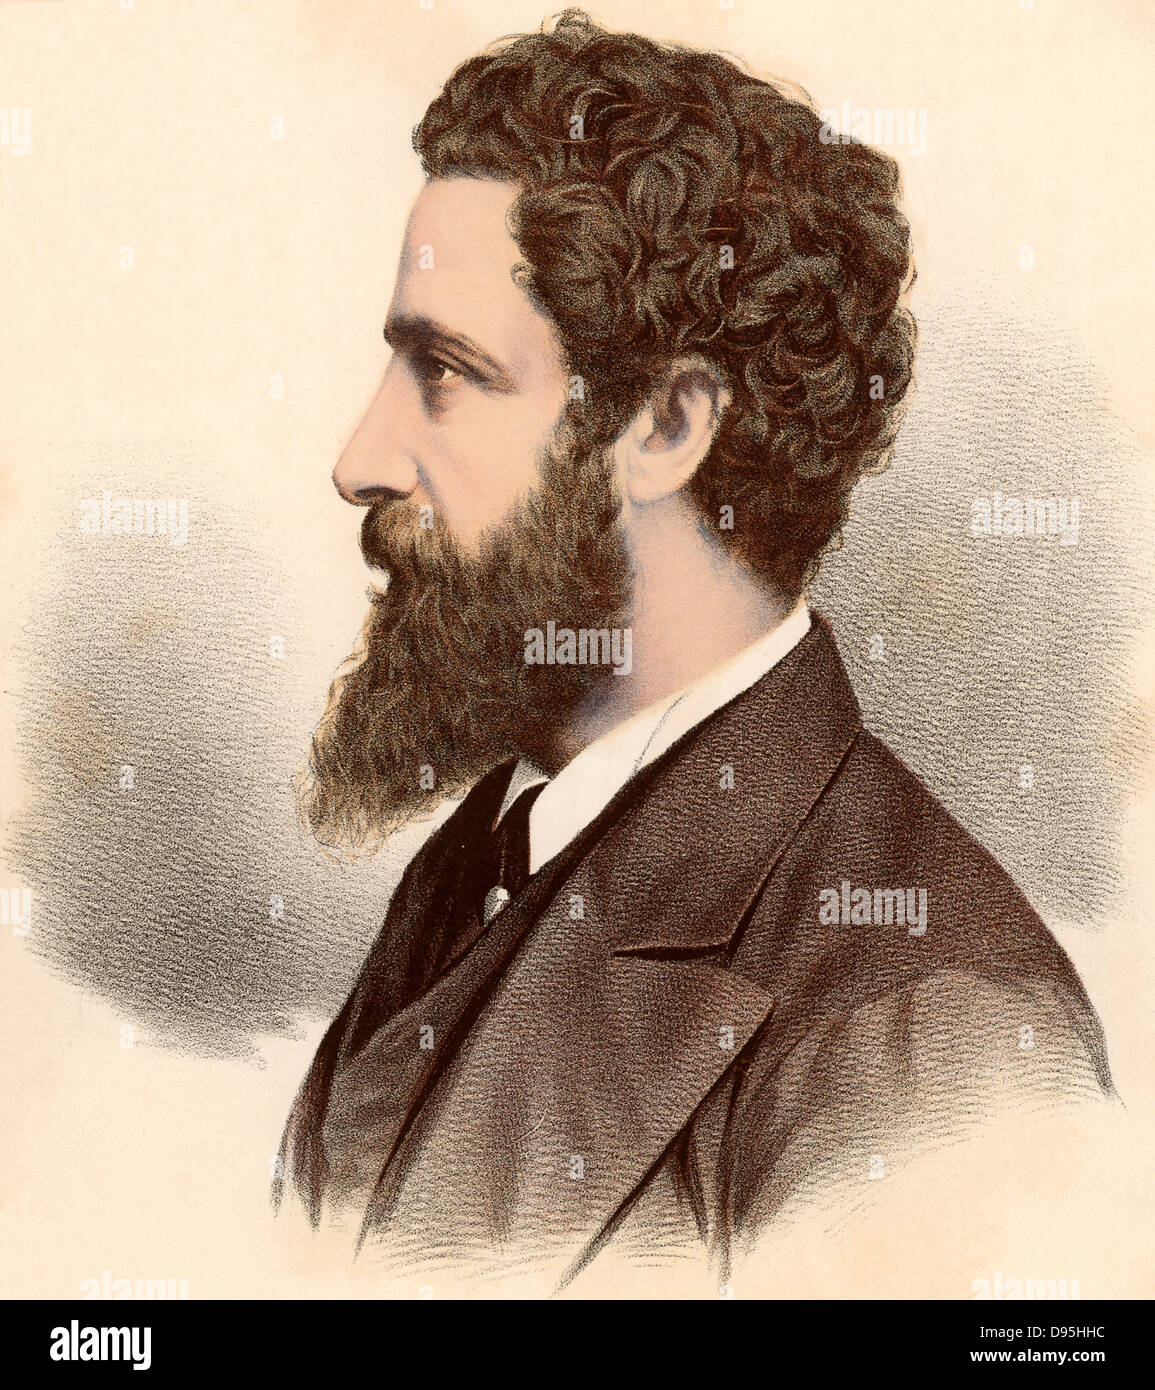 Edward Robert Bulwer Lytton, first Earl Lytton (1831-1891) British statesman, novelist and poet. Viceroy of India Stock Photo